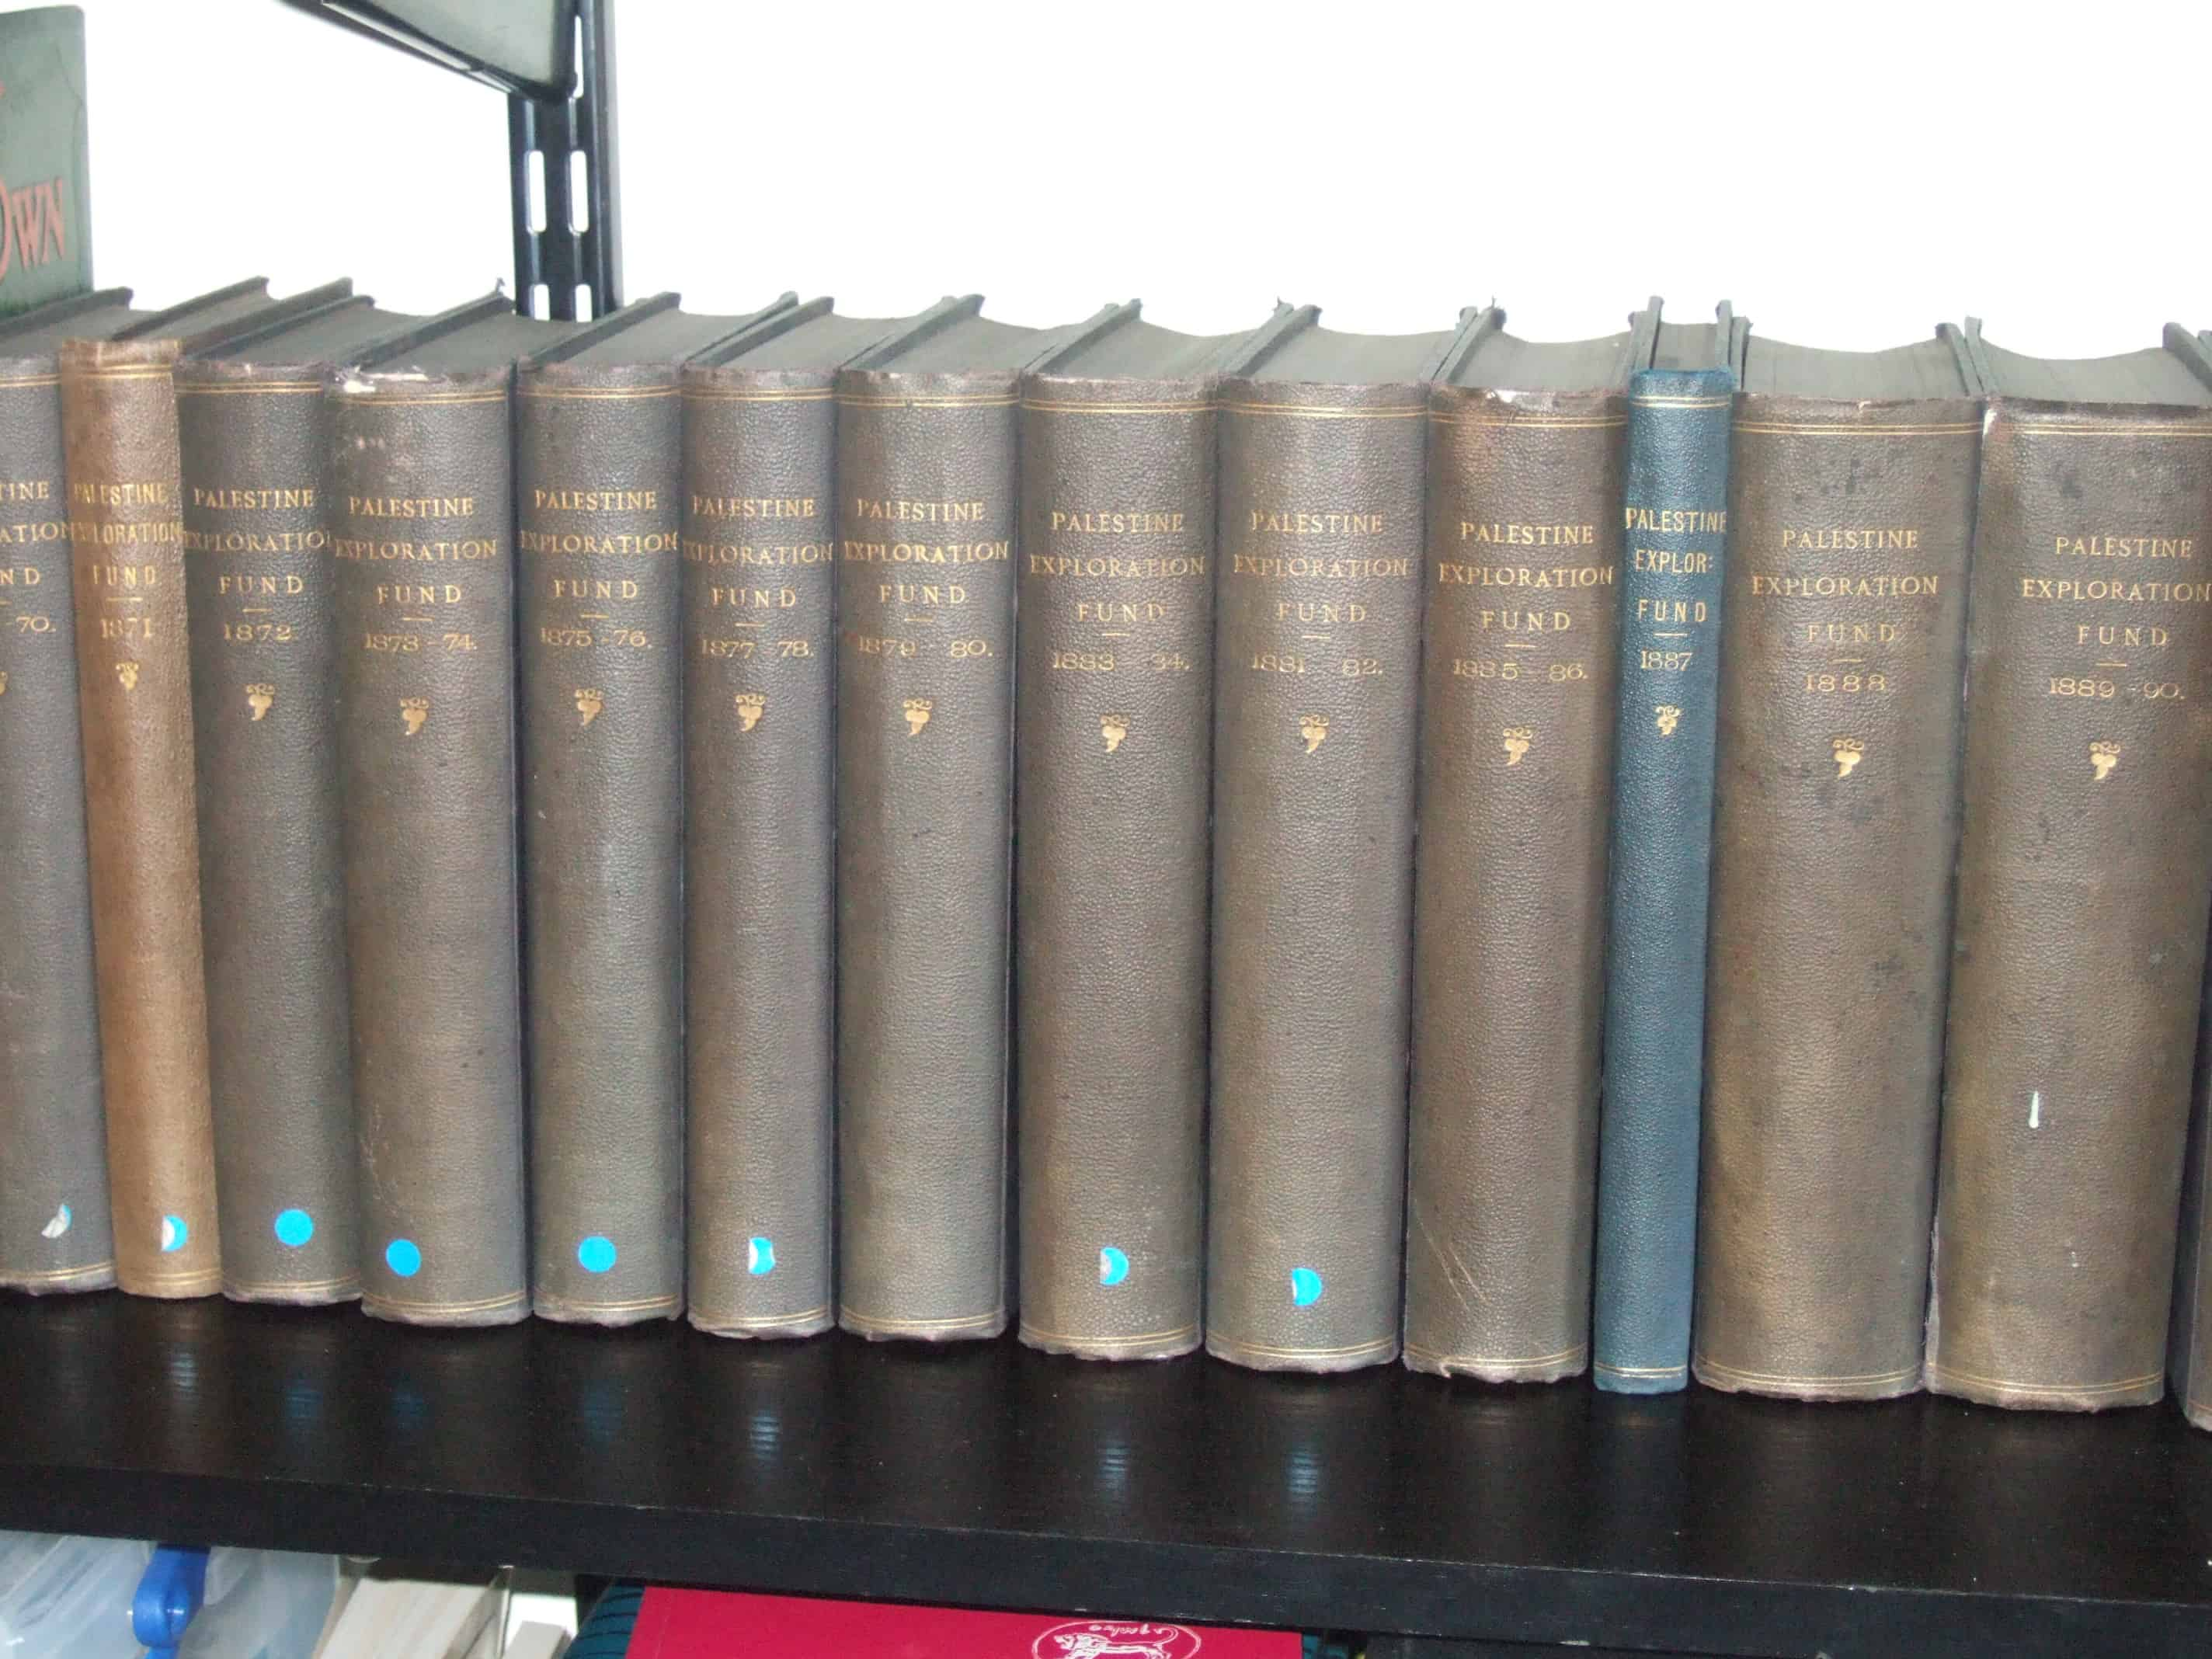 Journals needed for Digitisation